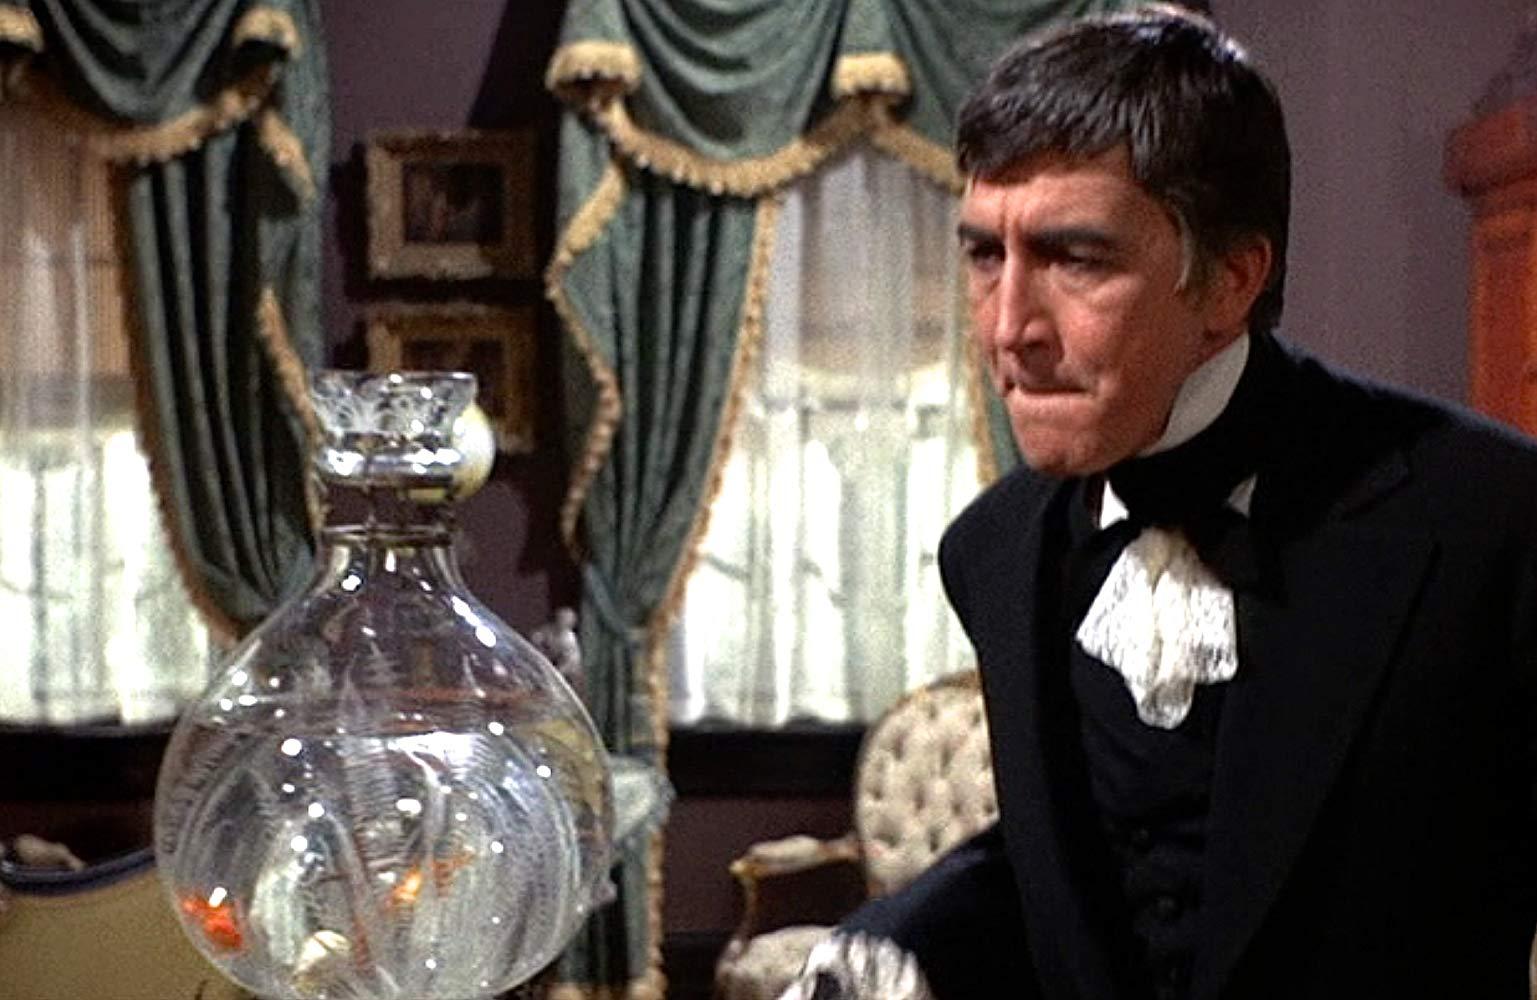 Patrick O'Neal as mad killer Jason Cravette in Chamber of Horrors (1966)